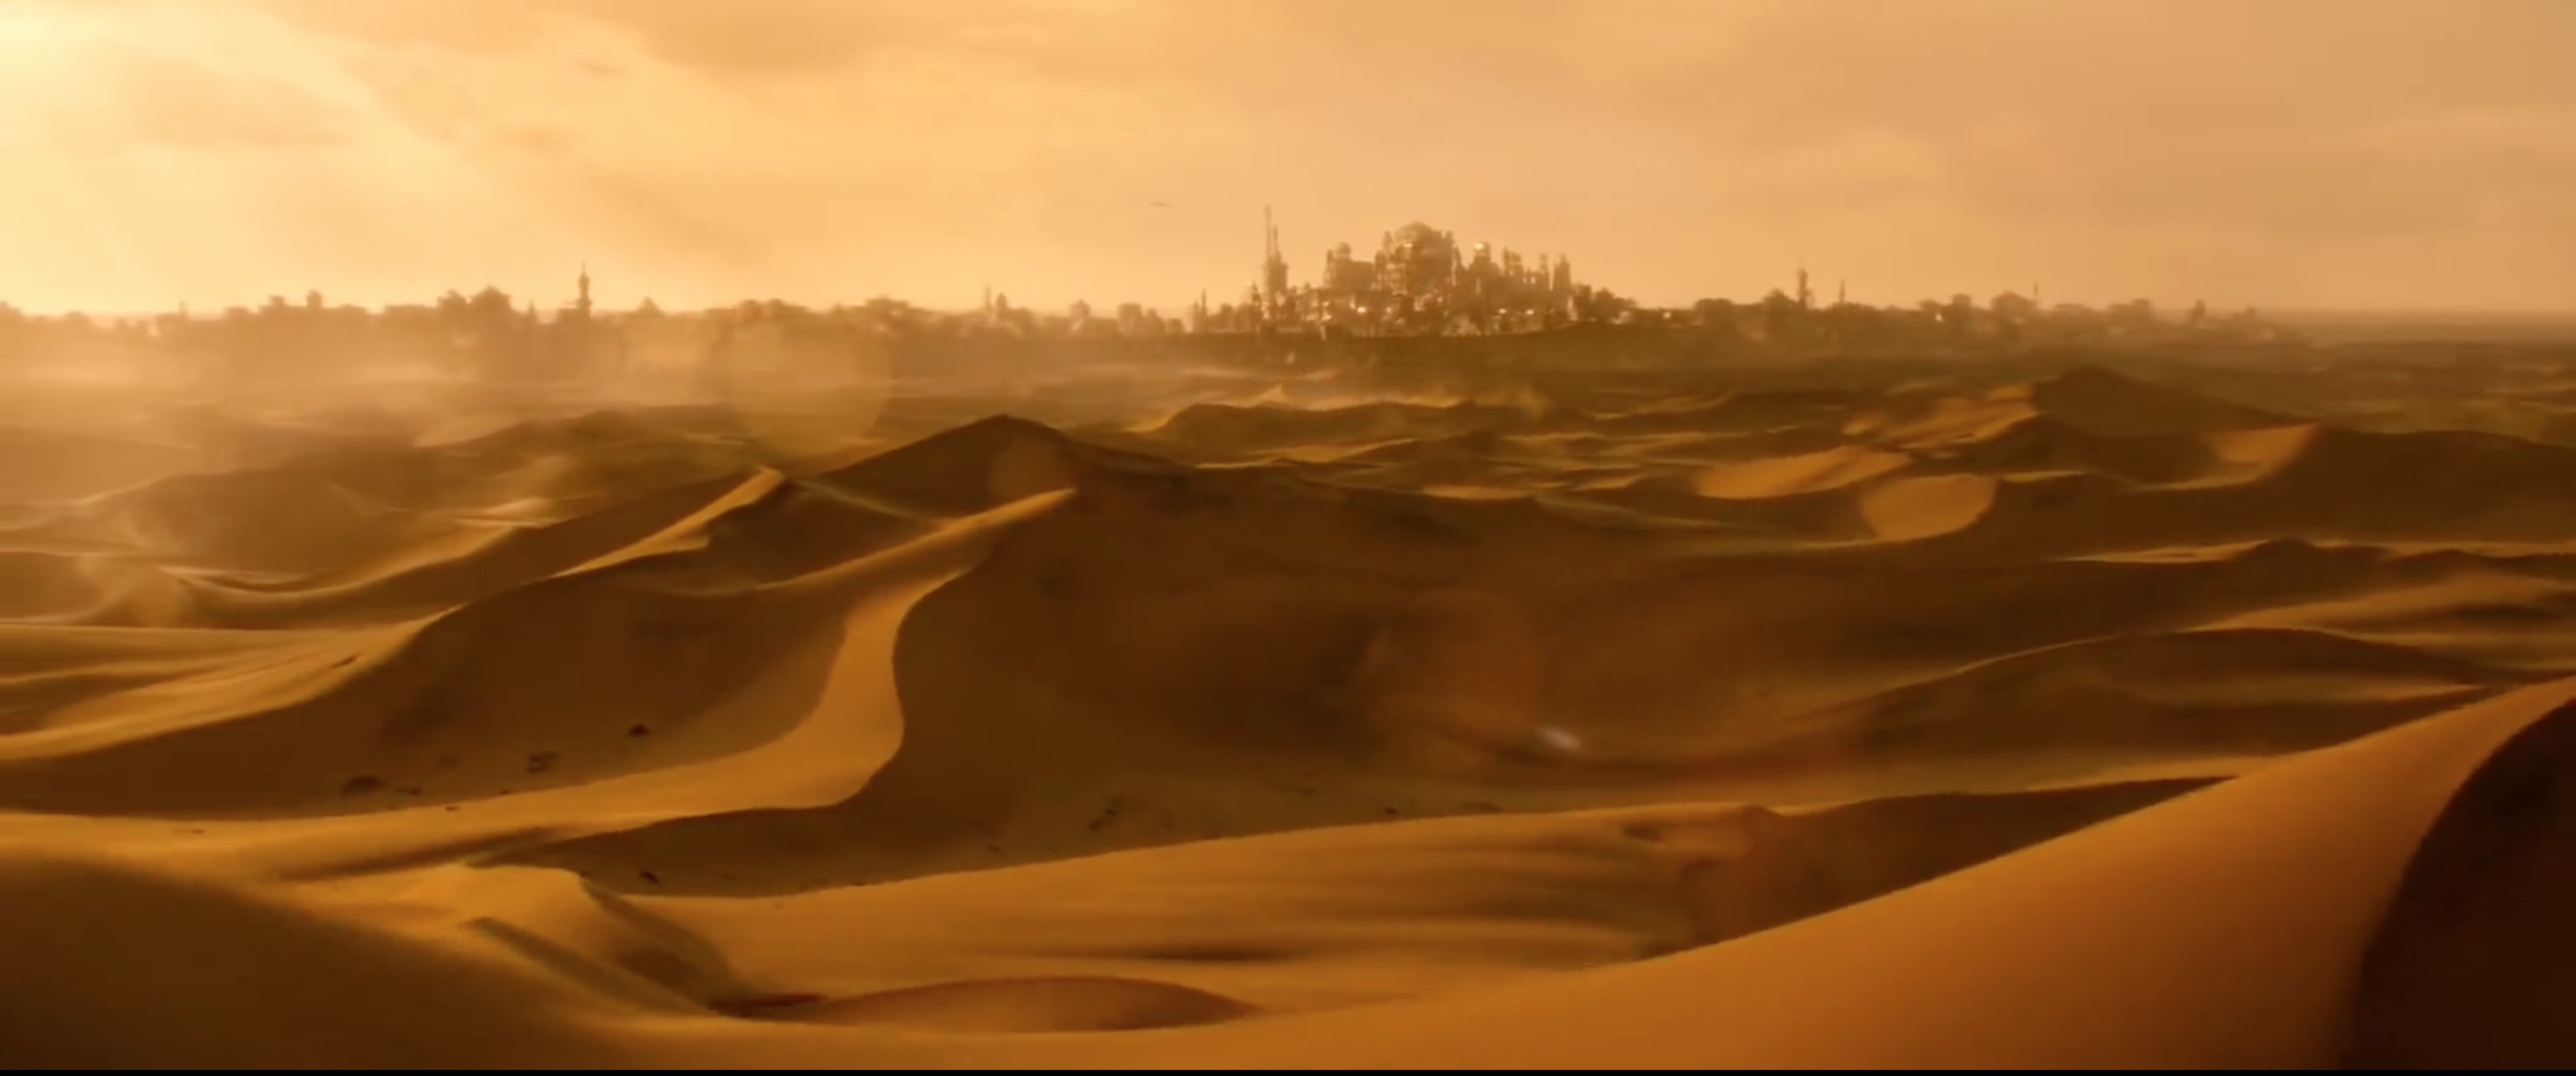 Disney's Aladdin First Official Trailer